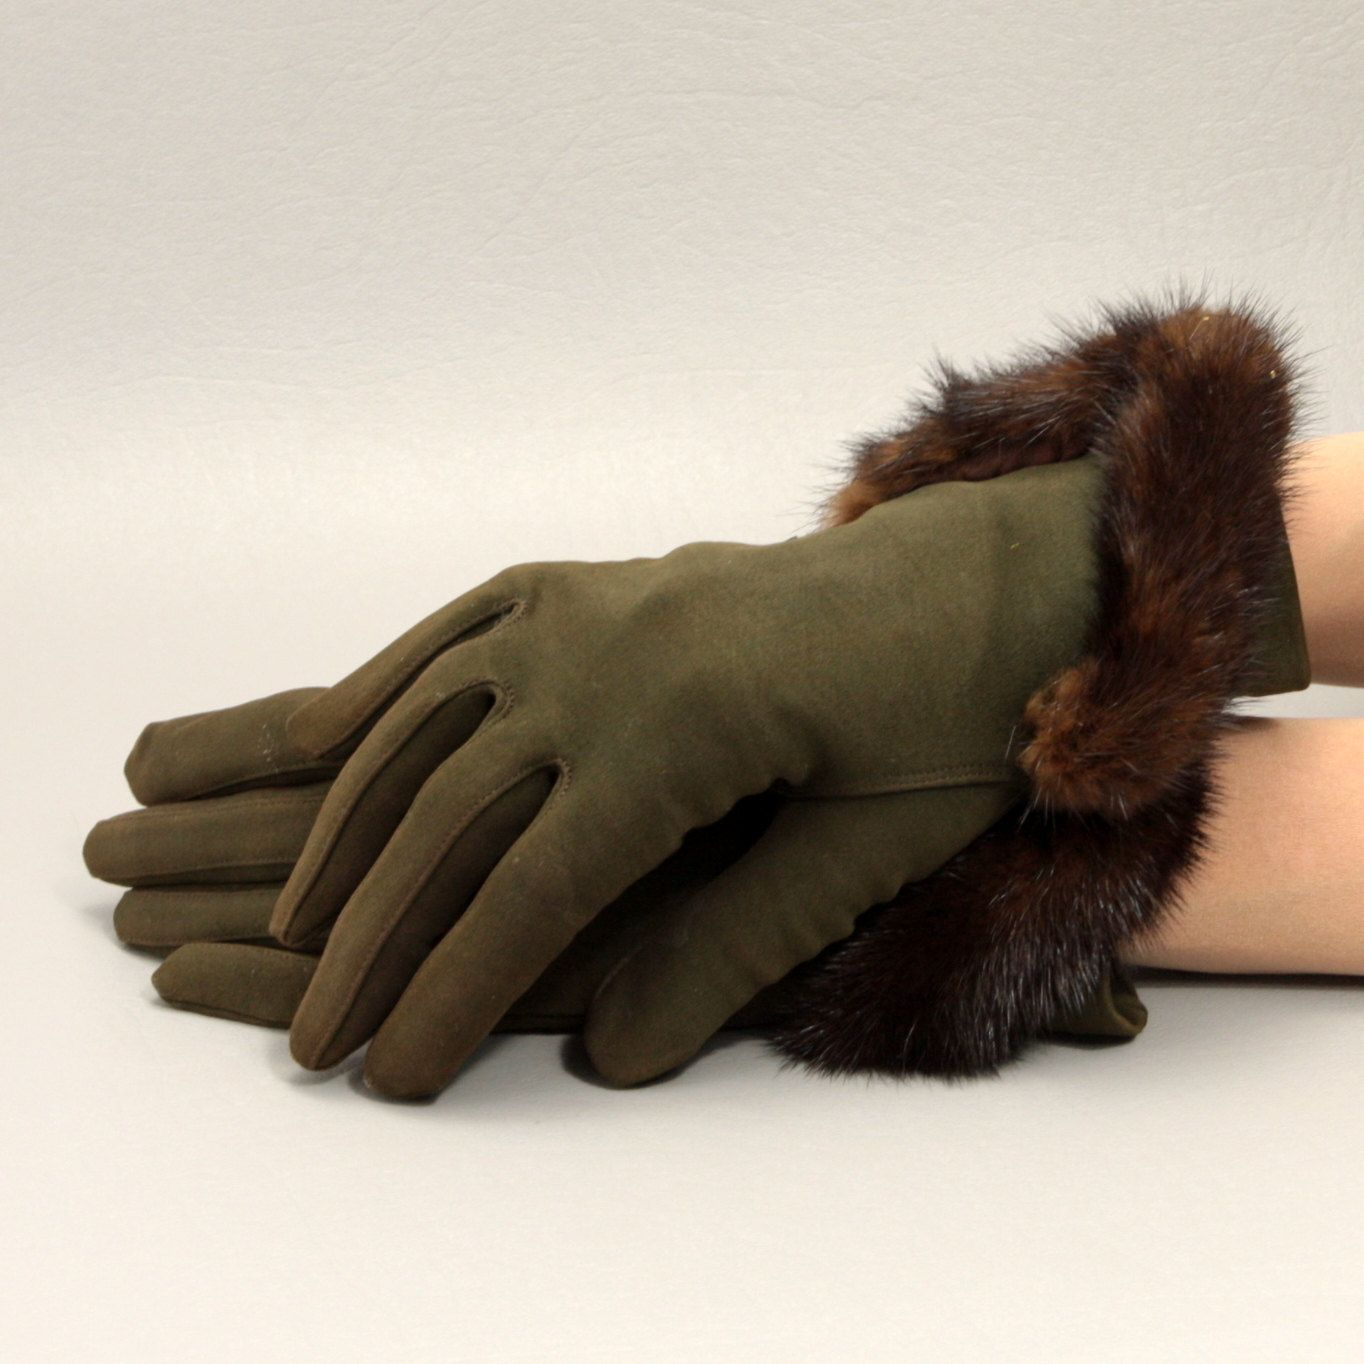 Brown w Fur Trim Vintage Gloves Sz 6 Over the Wrist Cotton